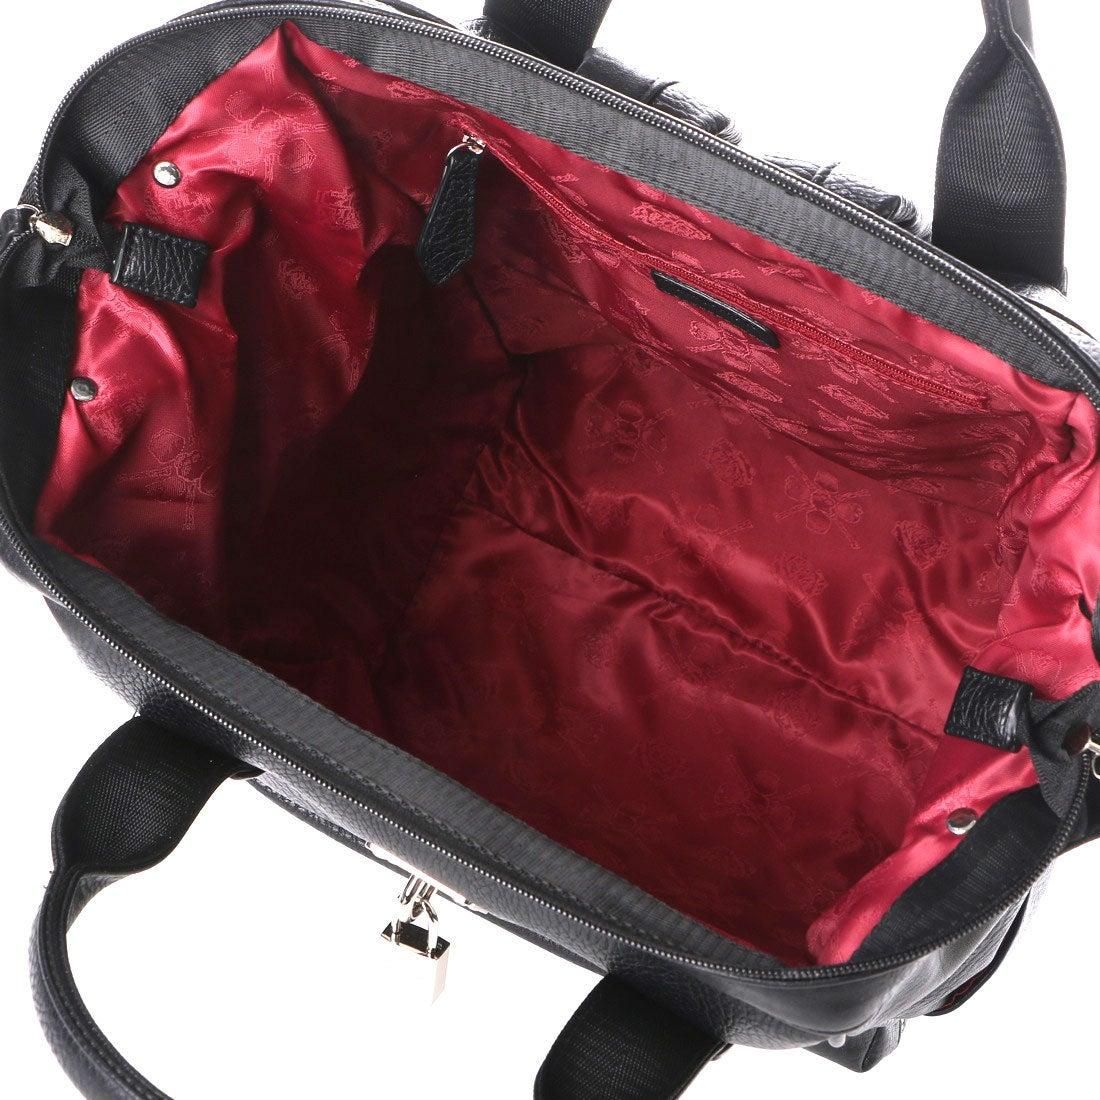 bf3325065e56 アルセラピィ artherapie クラッシュスタッズ クチガネリュックL (ブラック) -靴&ファッション通販 ロコンド〜自宅で試着、気軽に返品